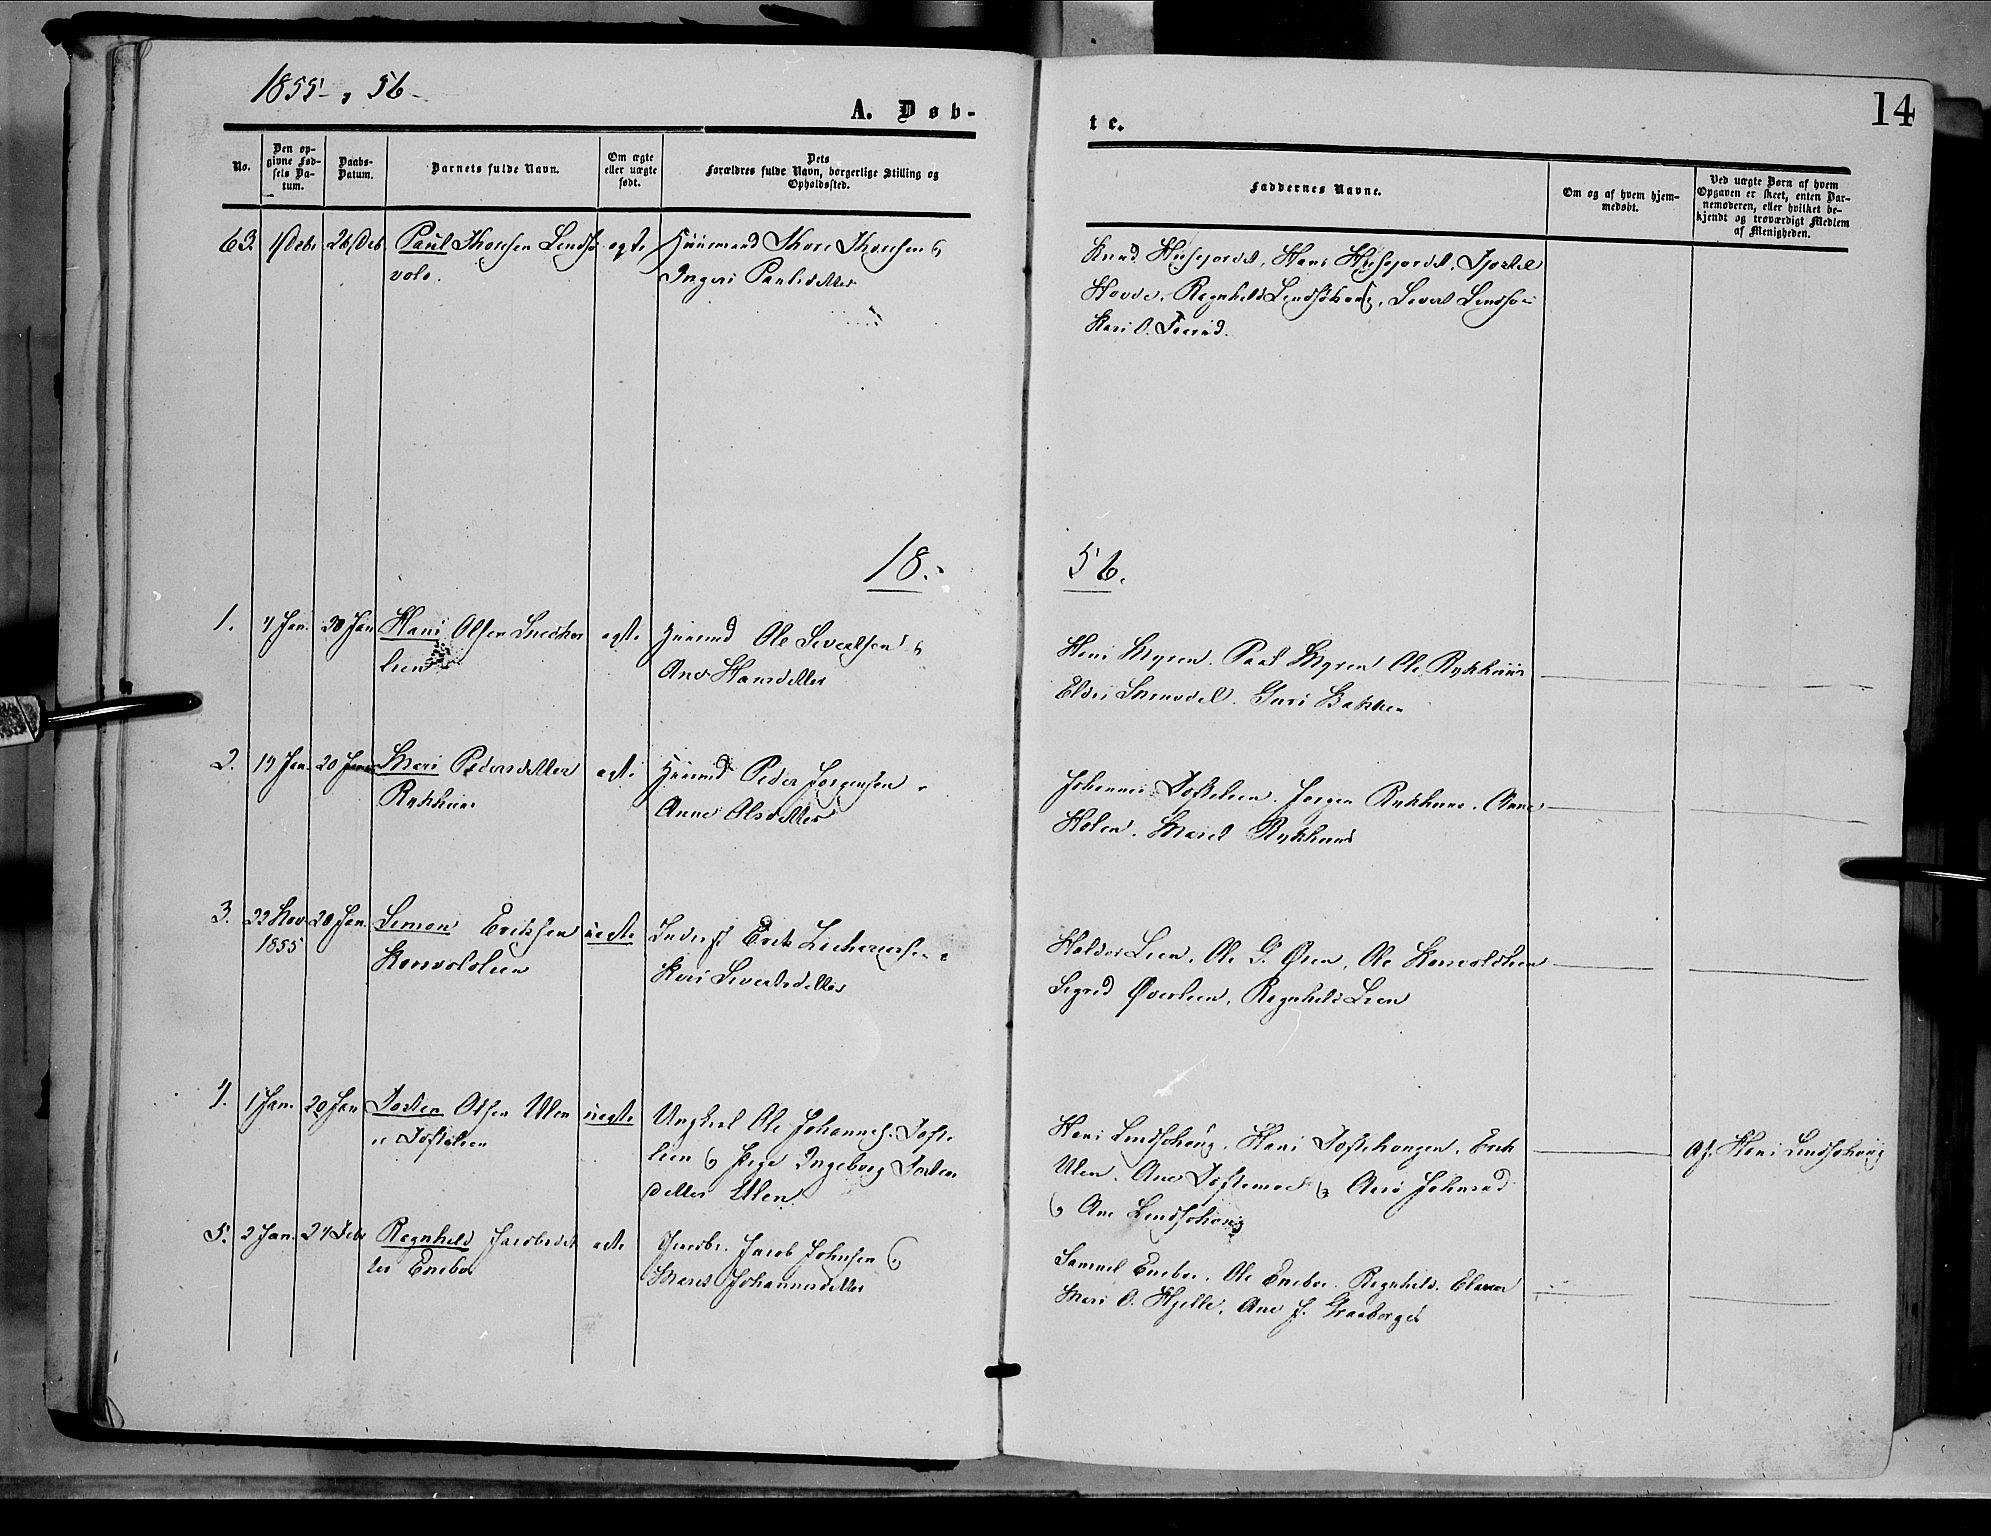 SAH, Dovre prestekontor, Parish register (official) no. 1, 1854-1878, p. 14